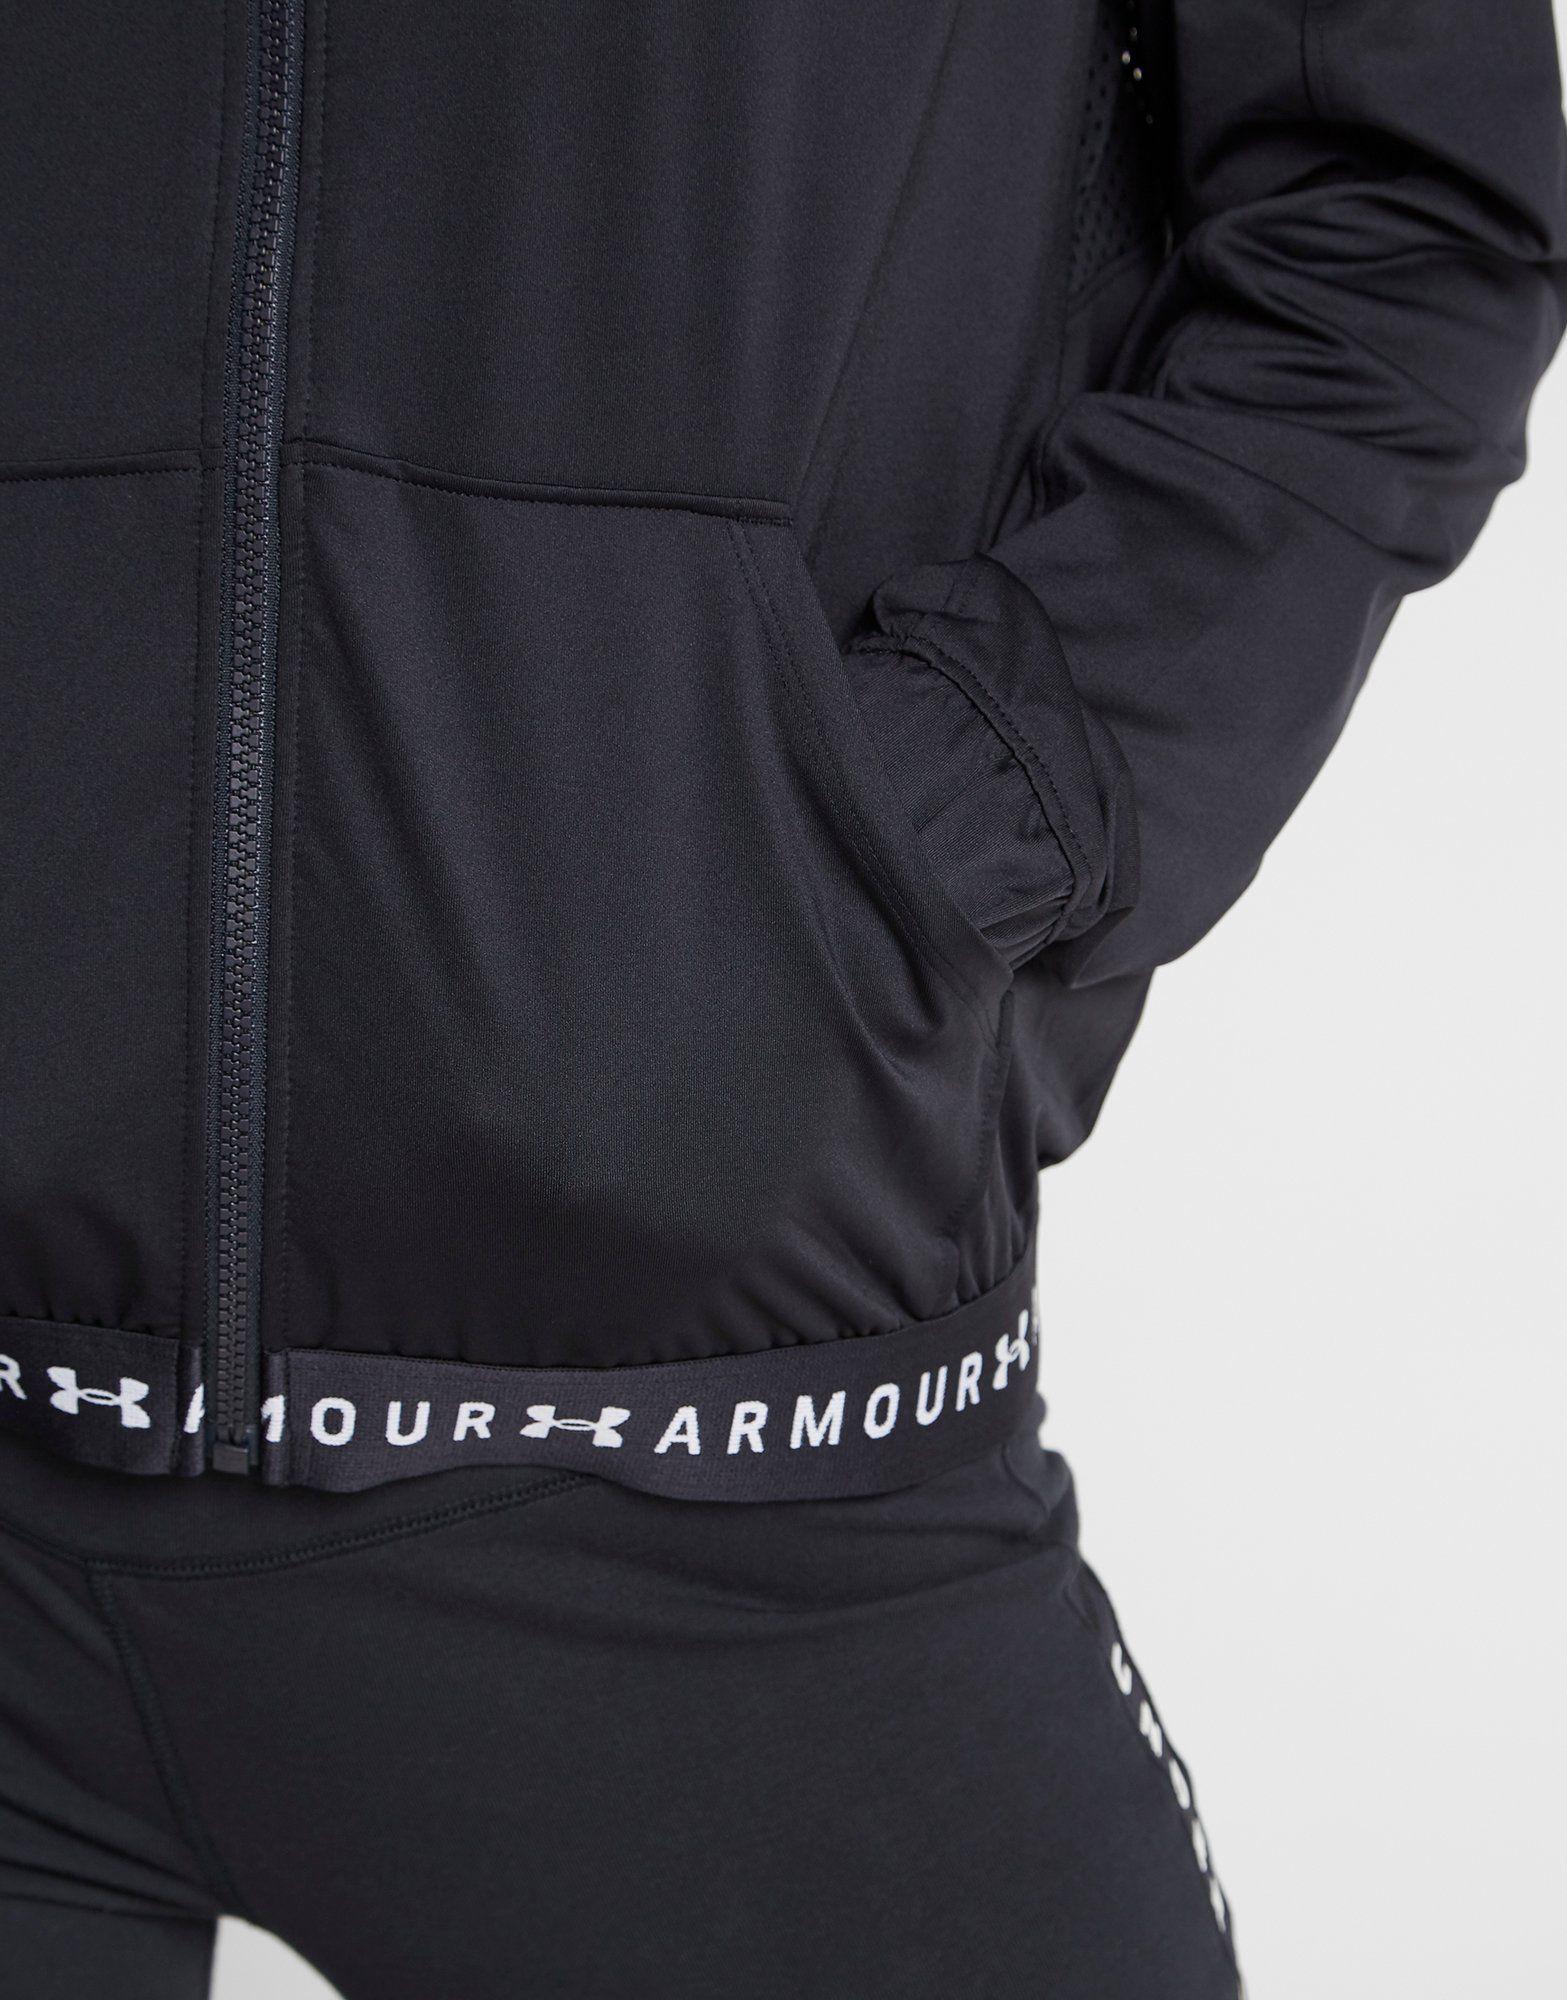 Under Armour HeatGear Full Zip Track Top